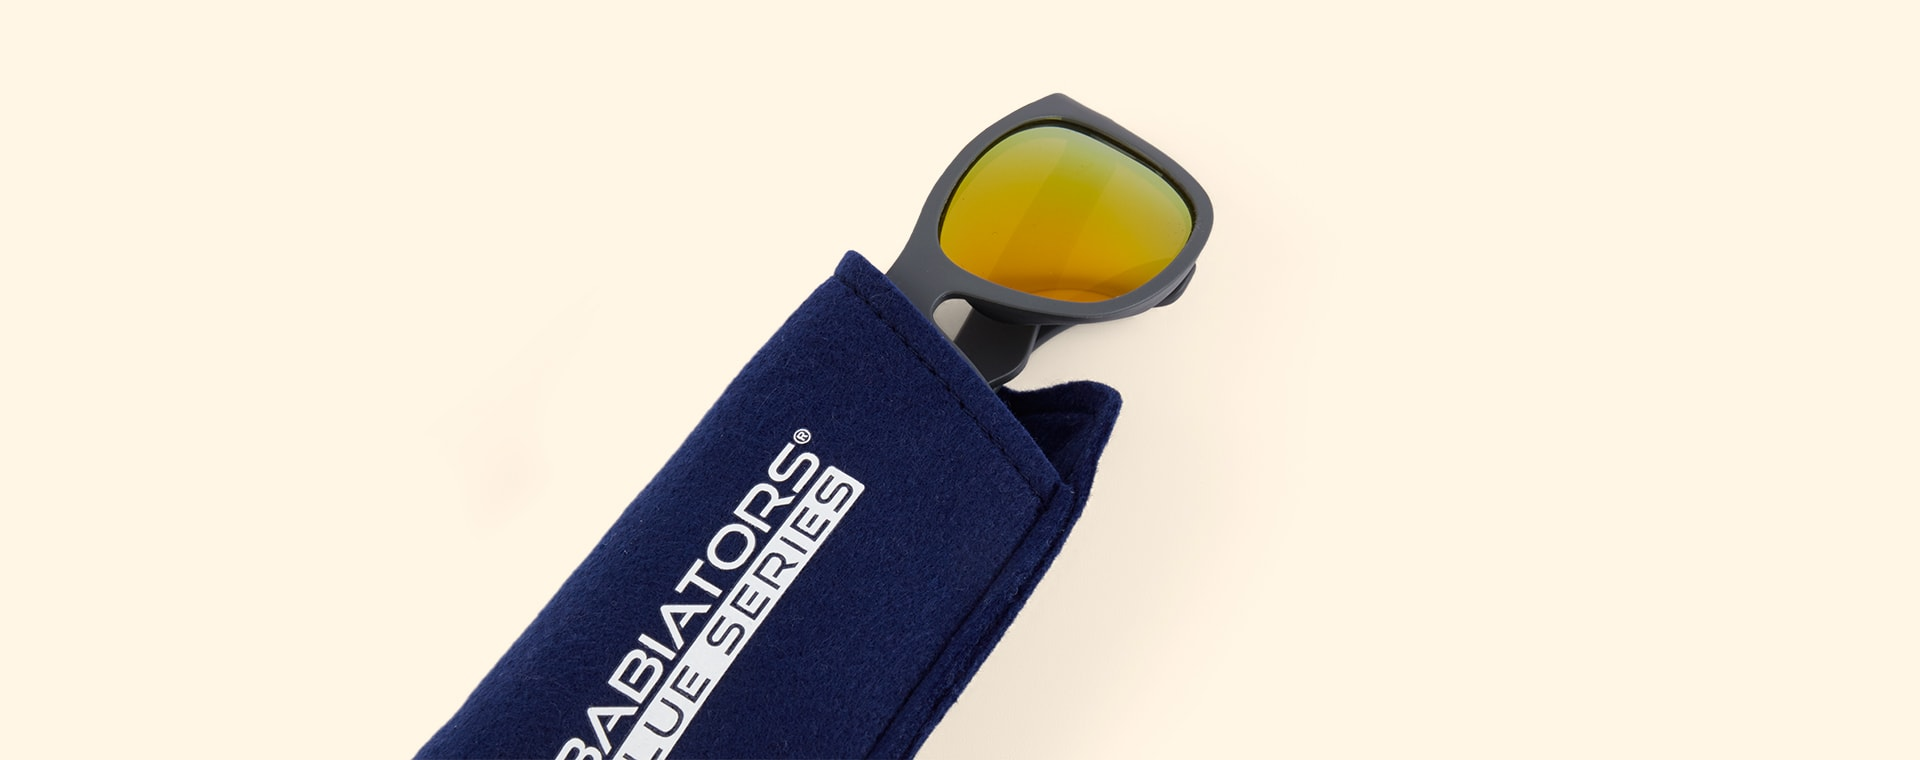 The Islander Babiators Blue Series Navigator Sunglasses